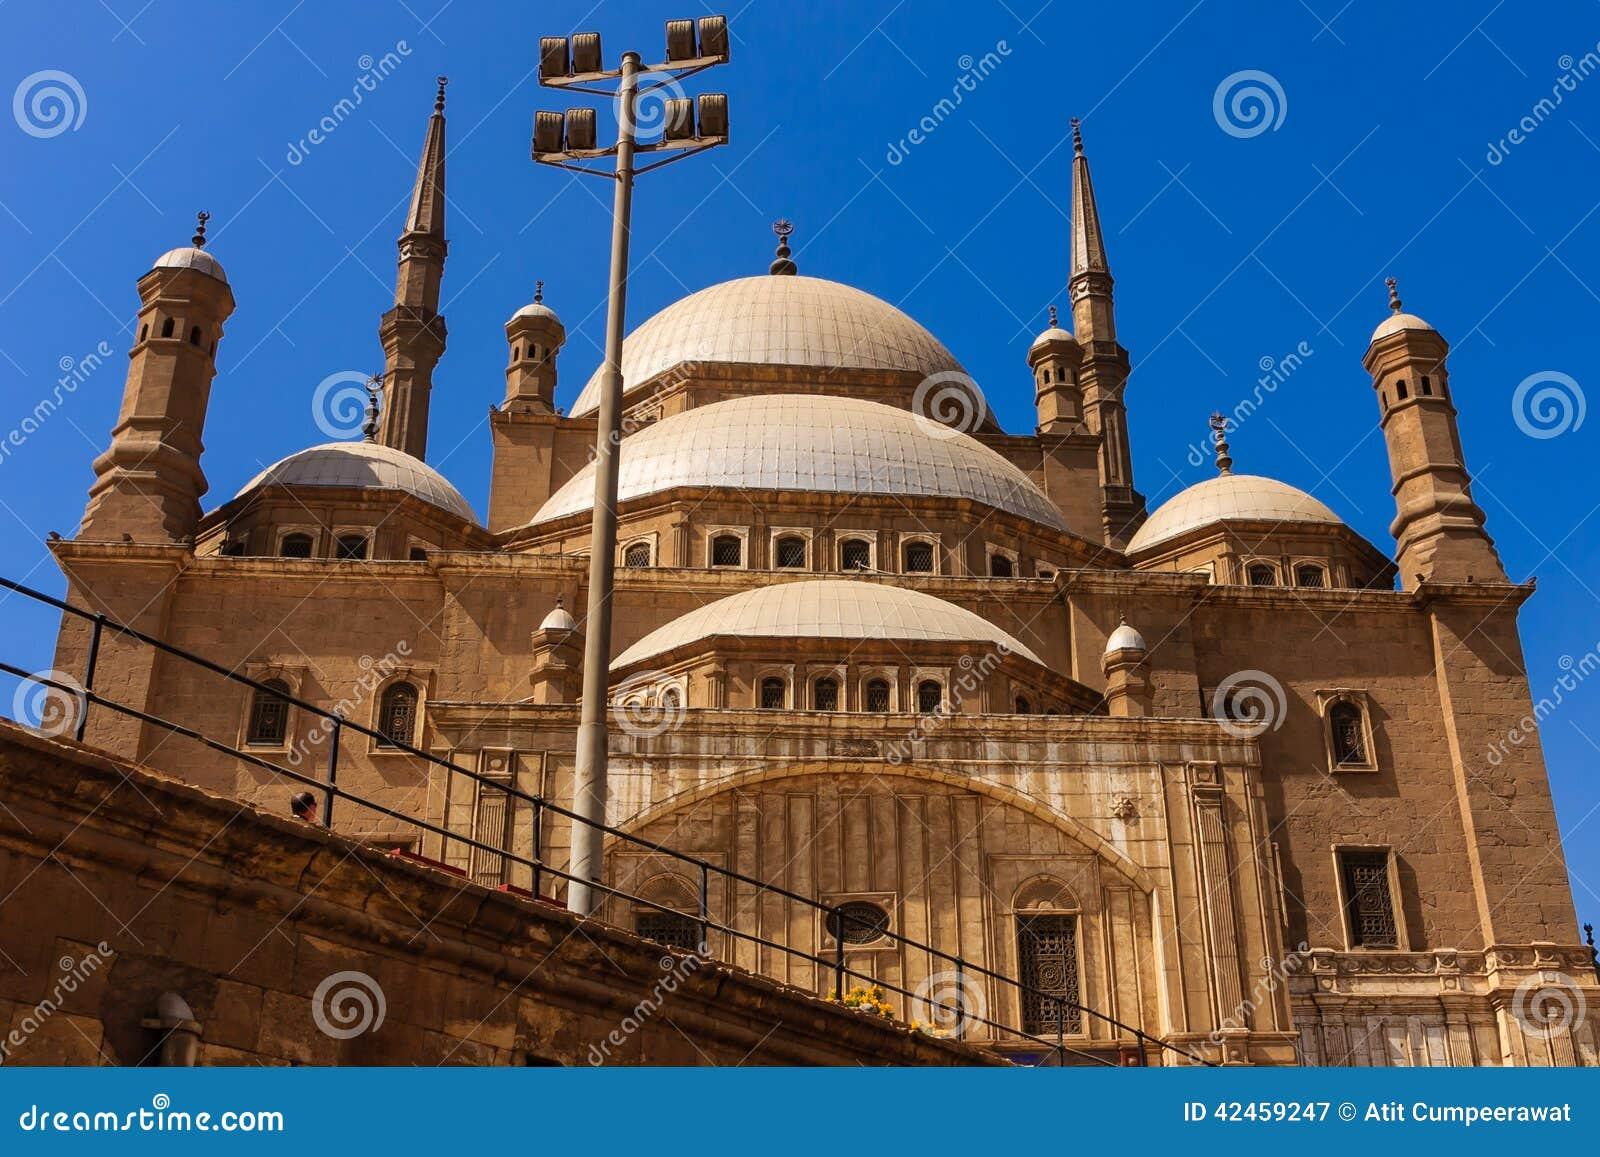 Mohamed Ali Mosque, Saladin Citadel von Kairo, Ägypten